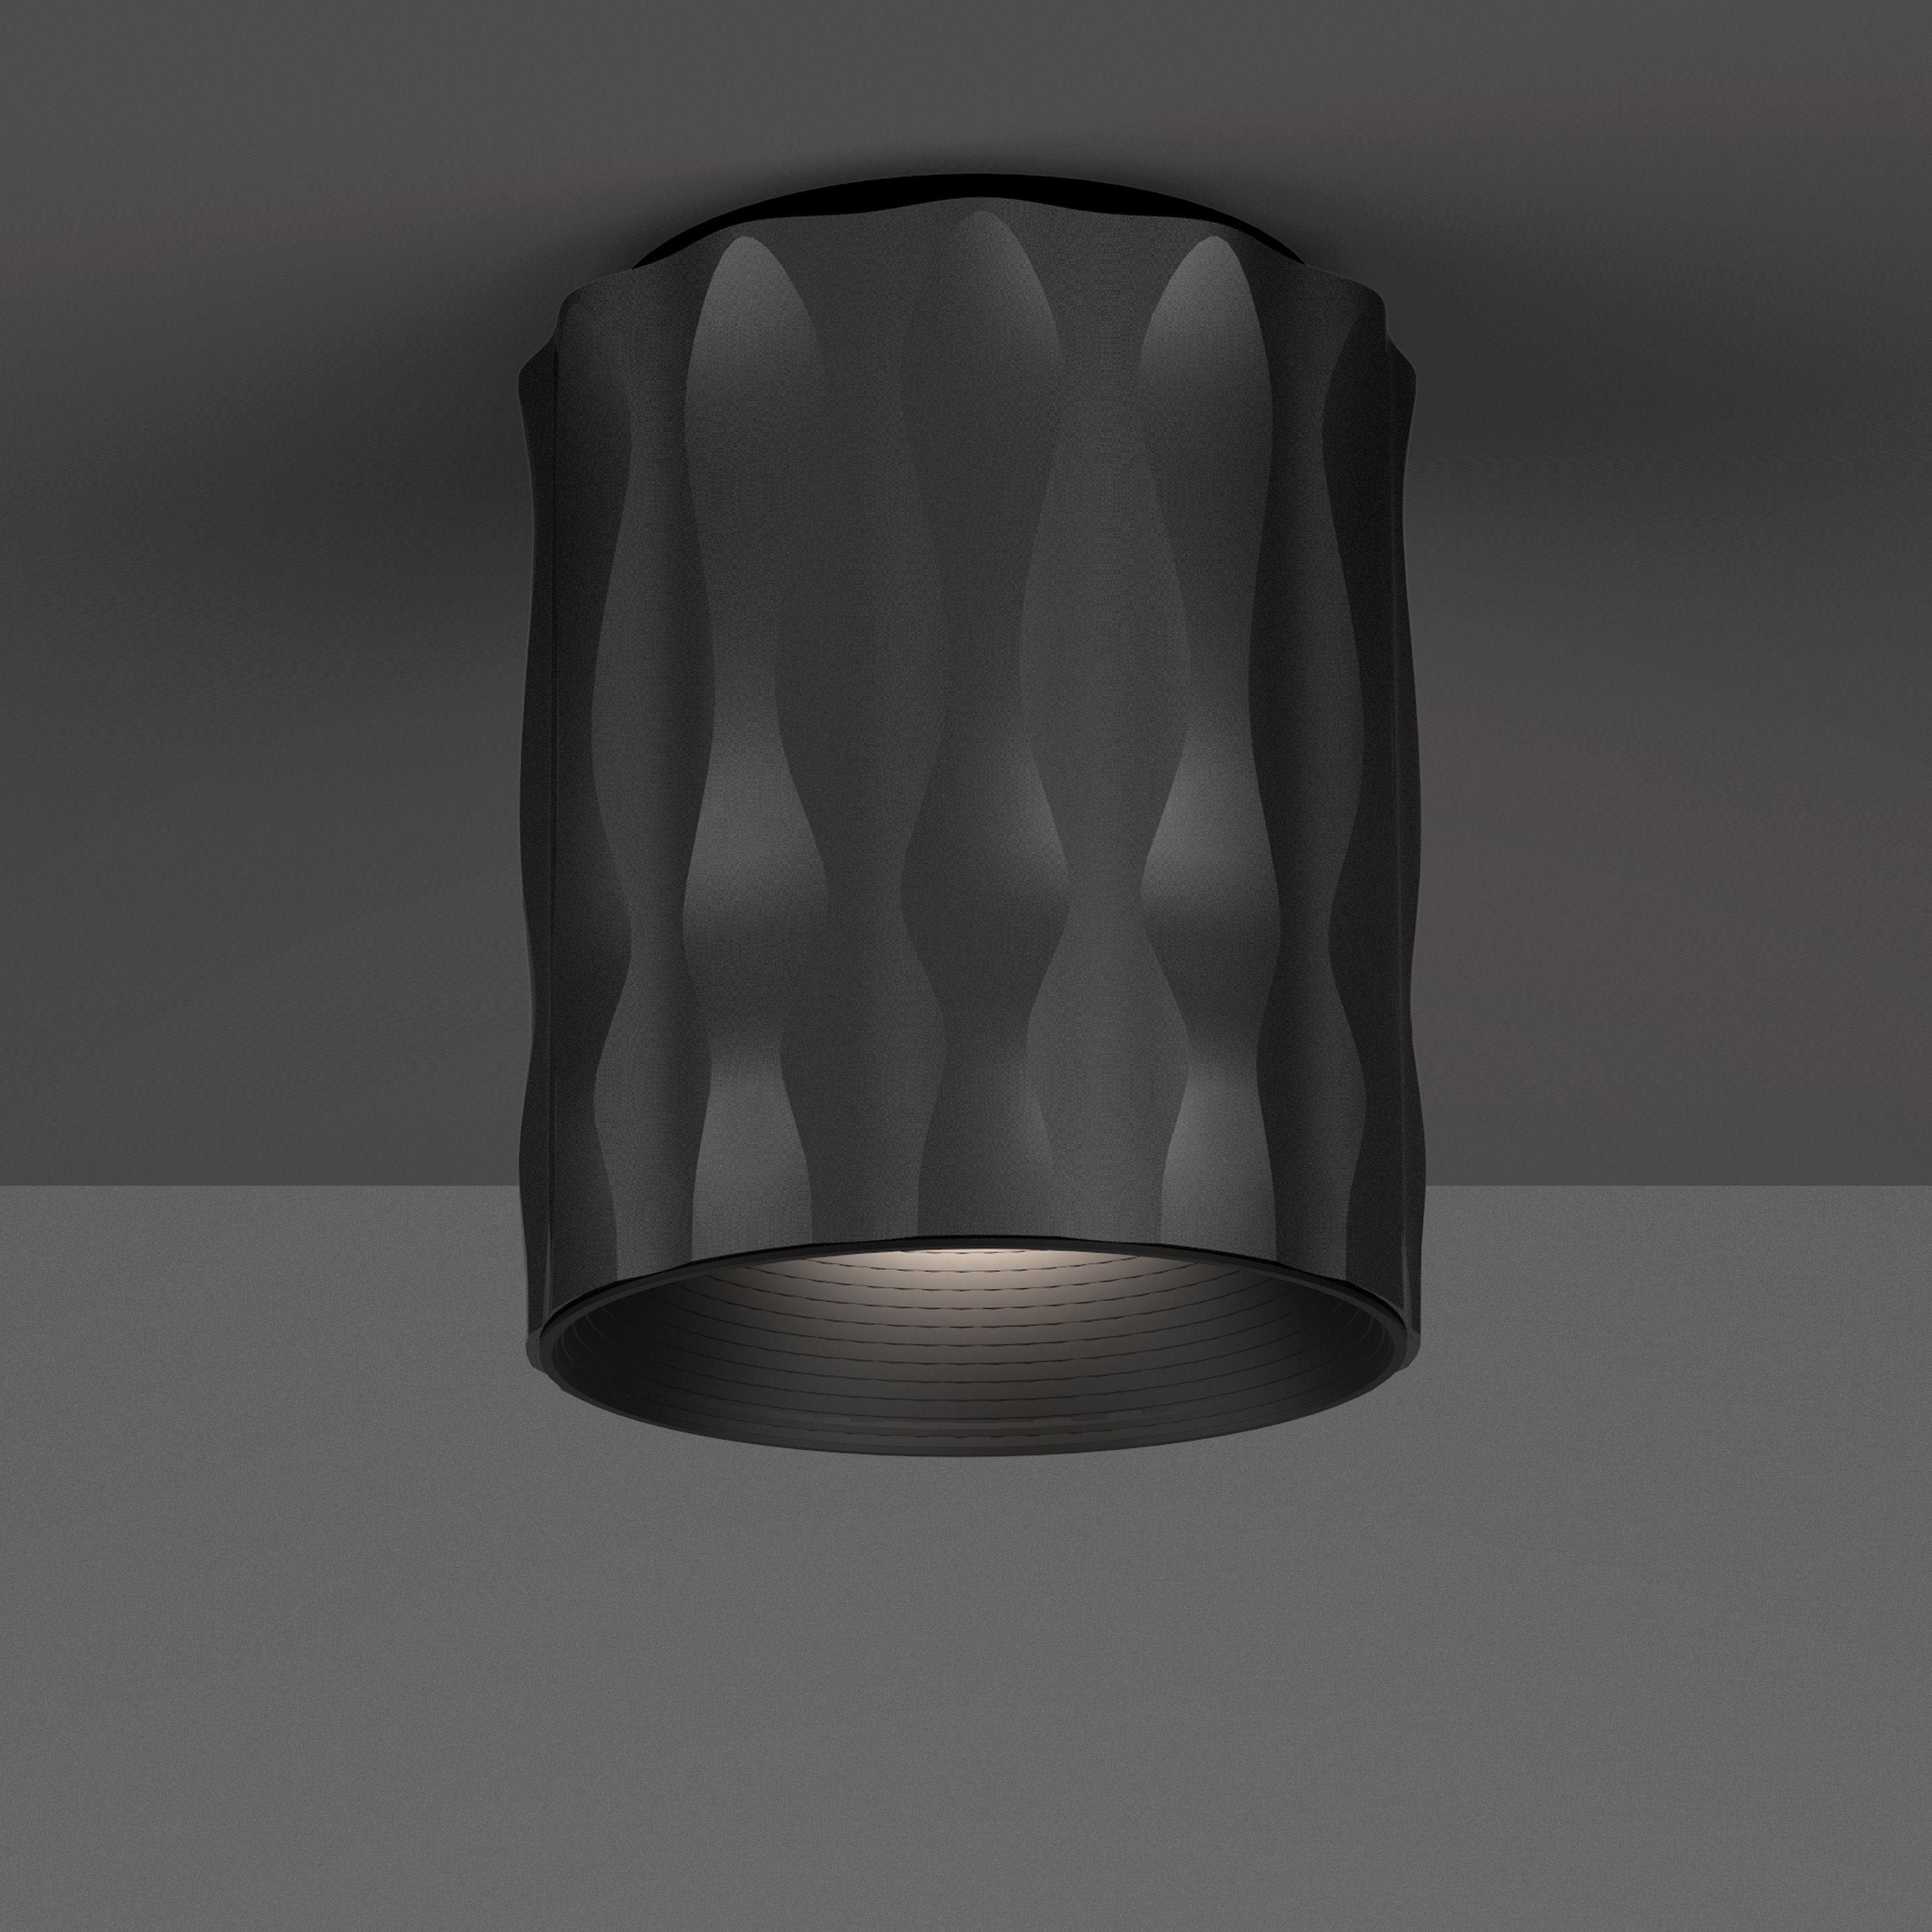 Luminaire - Plafonniers - Plafonnier Fiamma / H 16 cm - Artemide - Noir - Métal